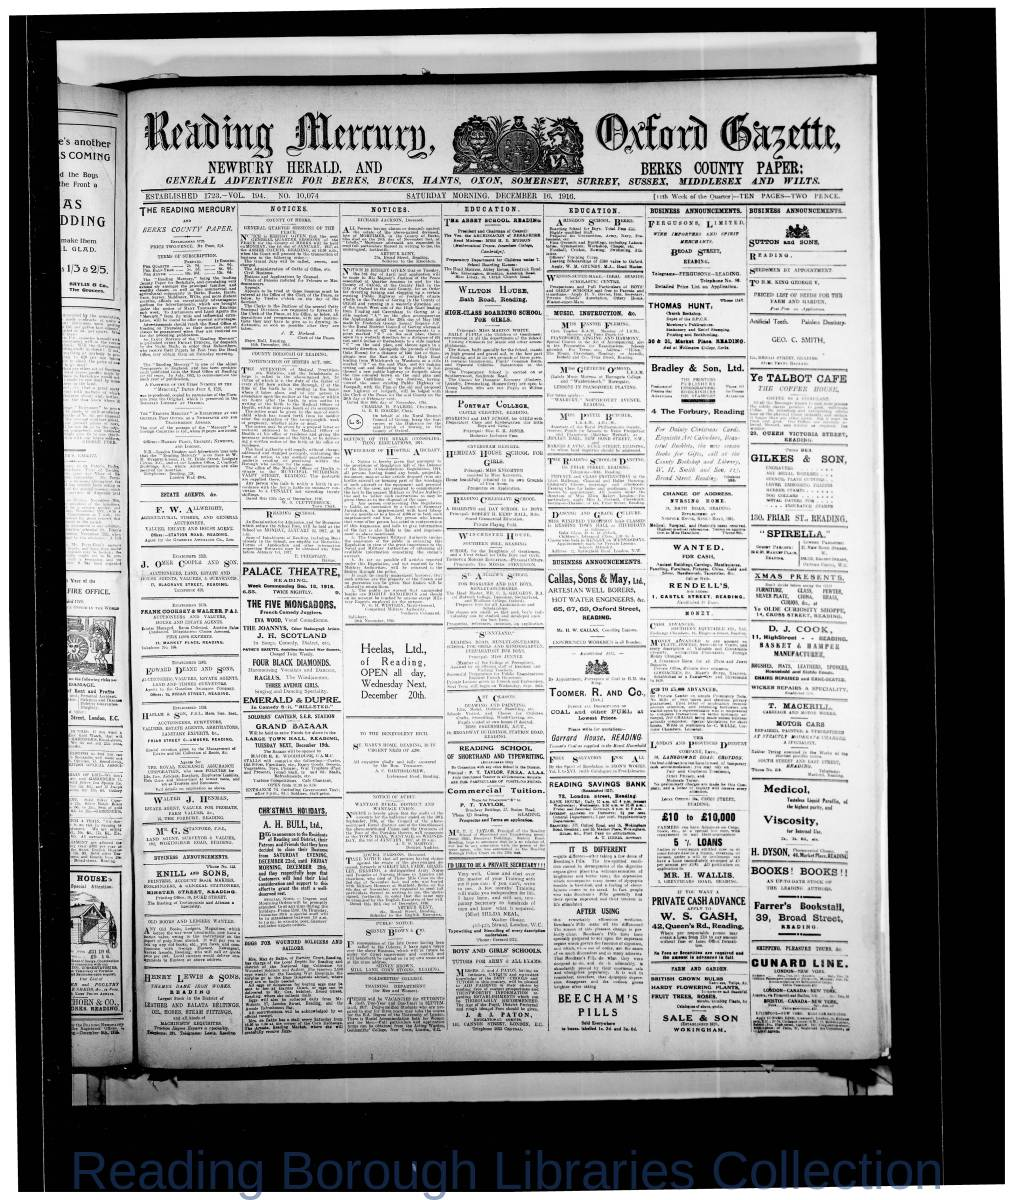 Reading Mercury Oxford Gazette Saturday, December 16, 1916. Pg 1